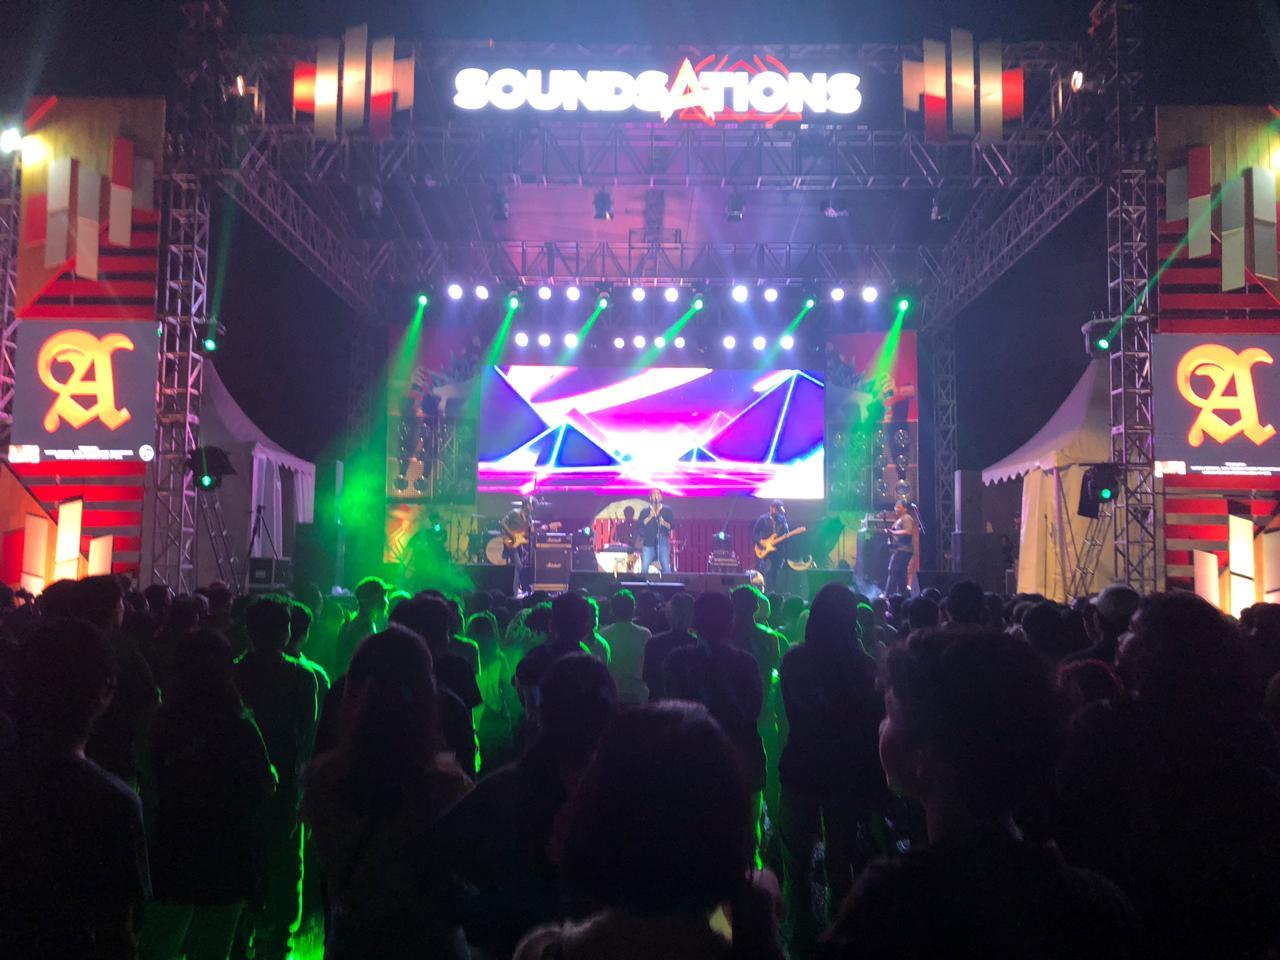 Event Soundsation ITC Depok 2019